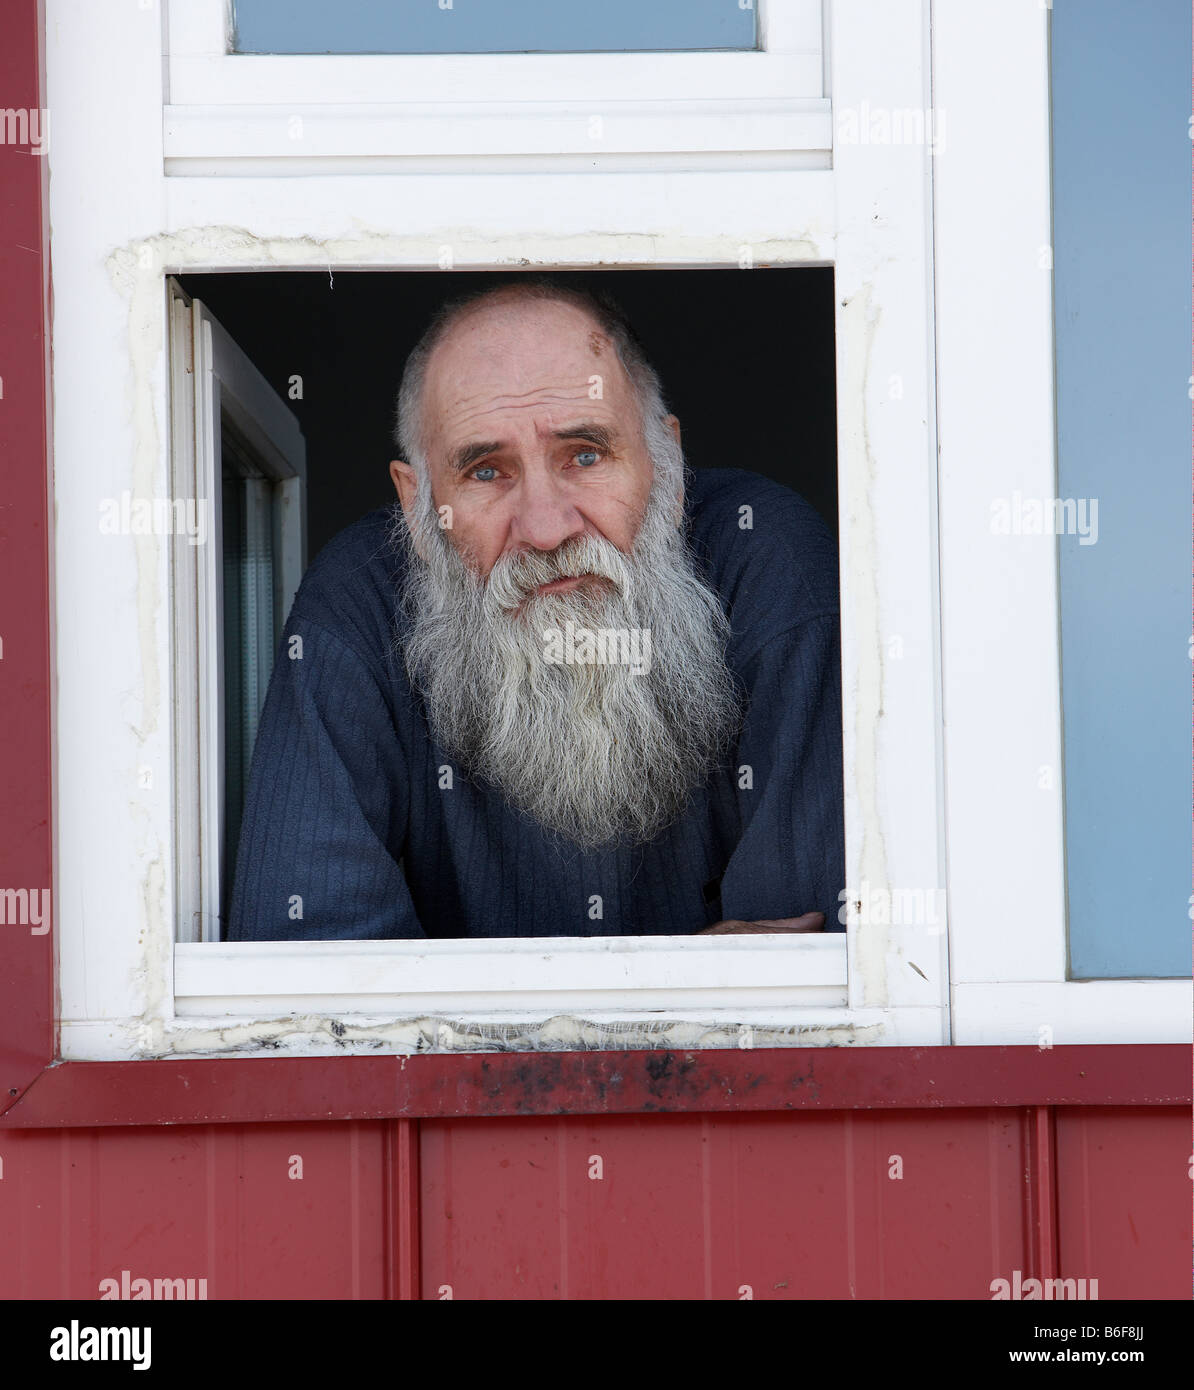 f2f4dfccc4a7 Elderly Man With White Beard Stock Photos   Elderly Man With White ...